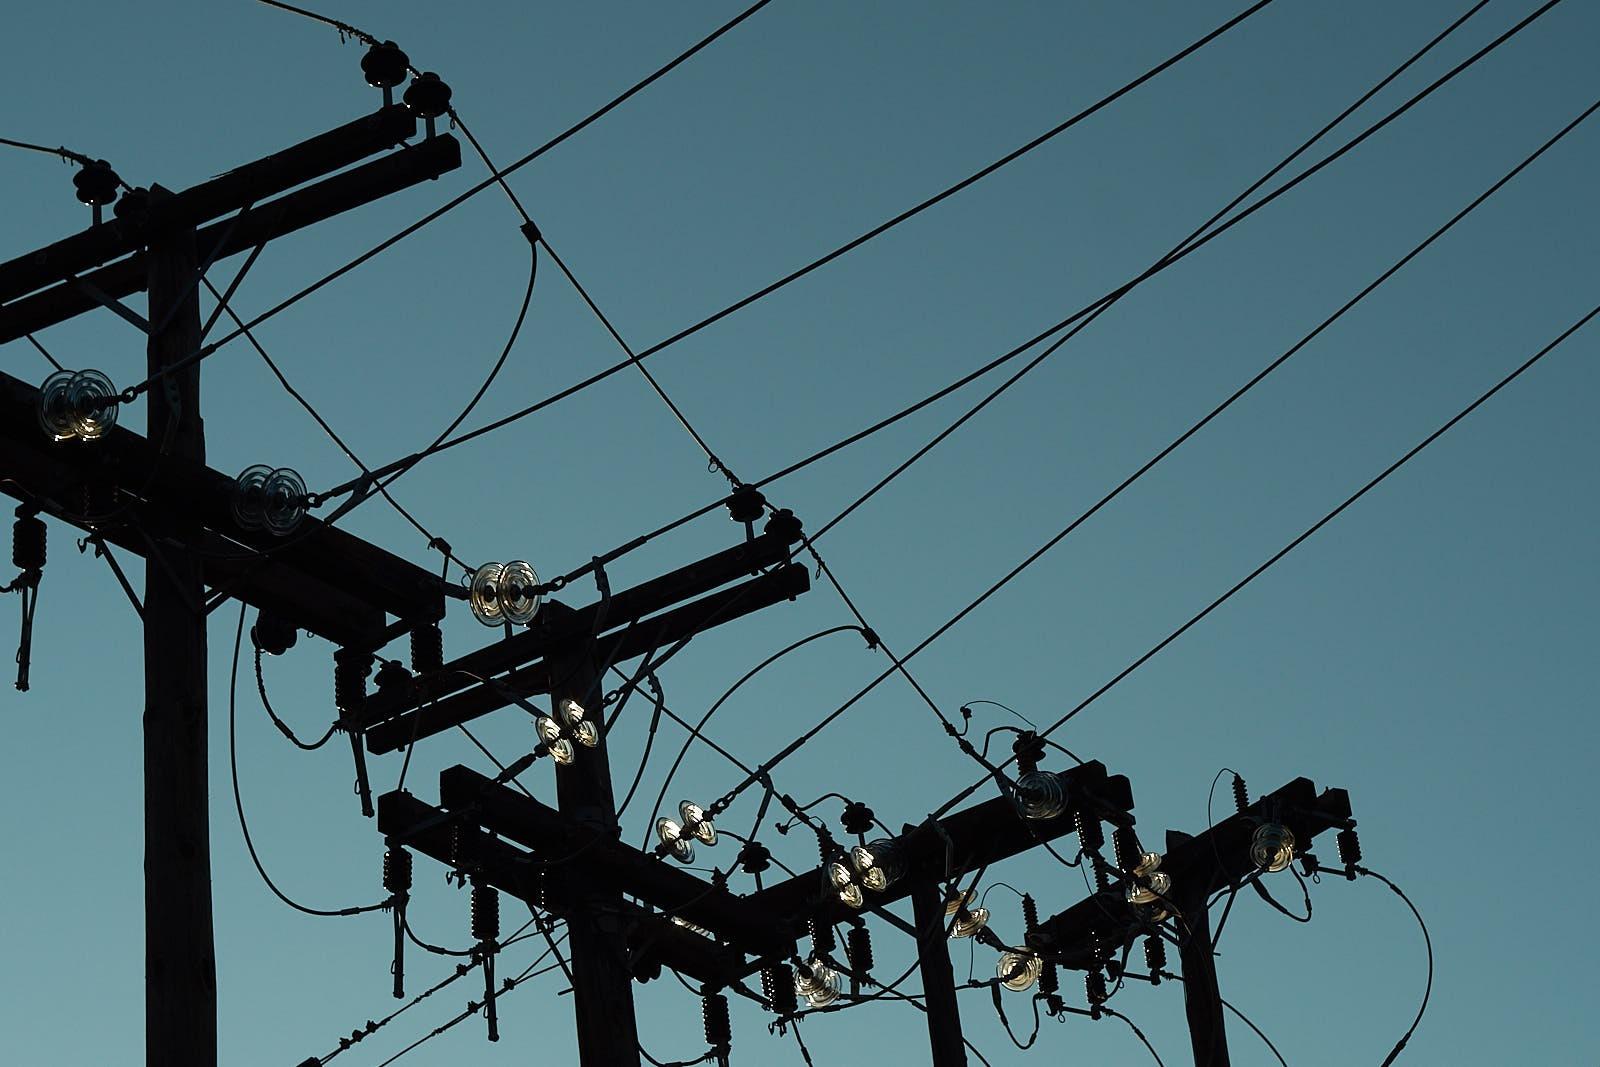 Power Poles at Dusk by Zoran Rilak